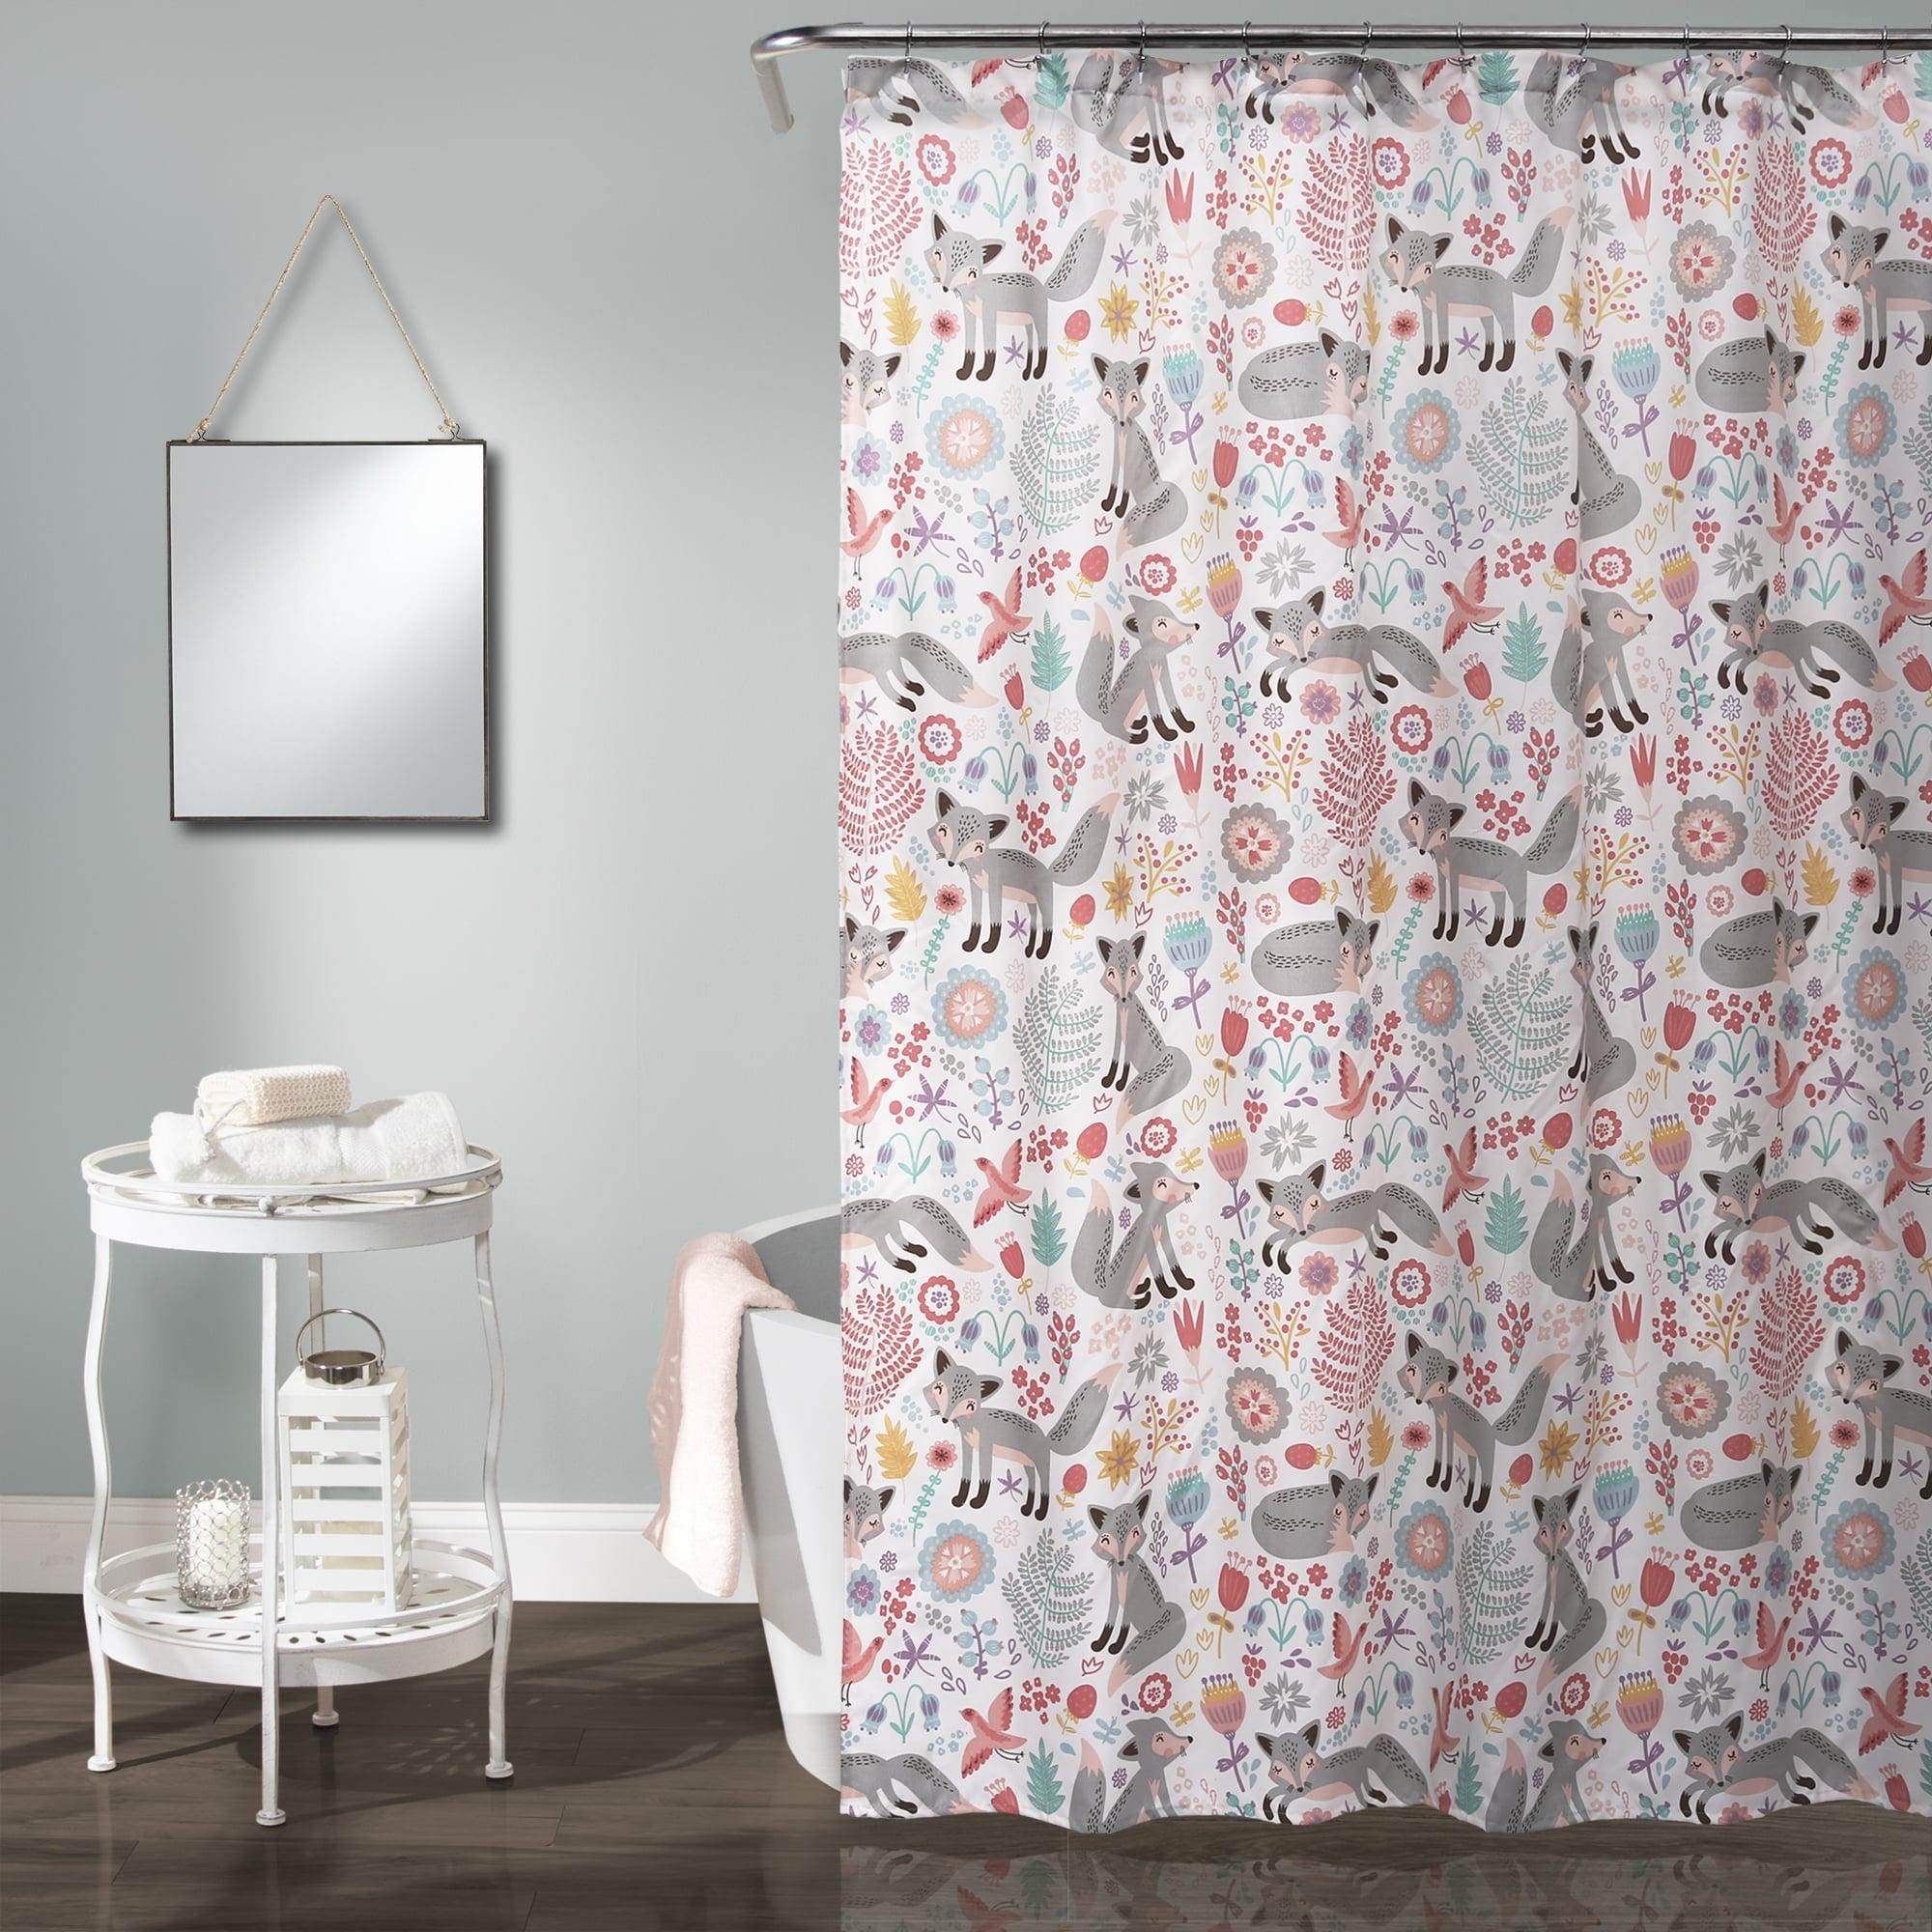 Fox Shower Curtain Foxes Ornate Flowers Birds Print for Bathroom